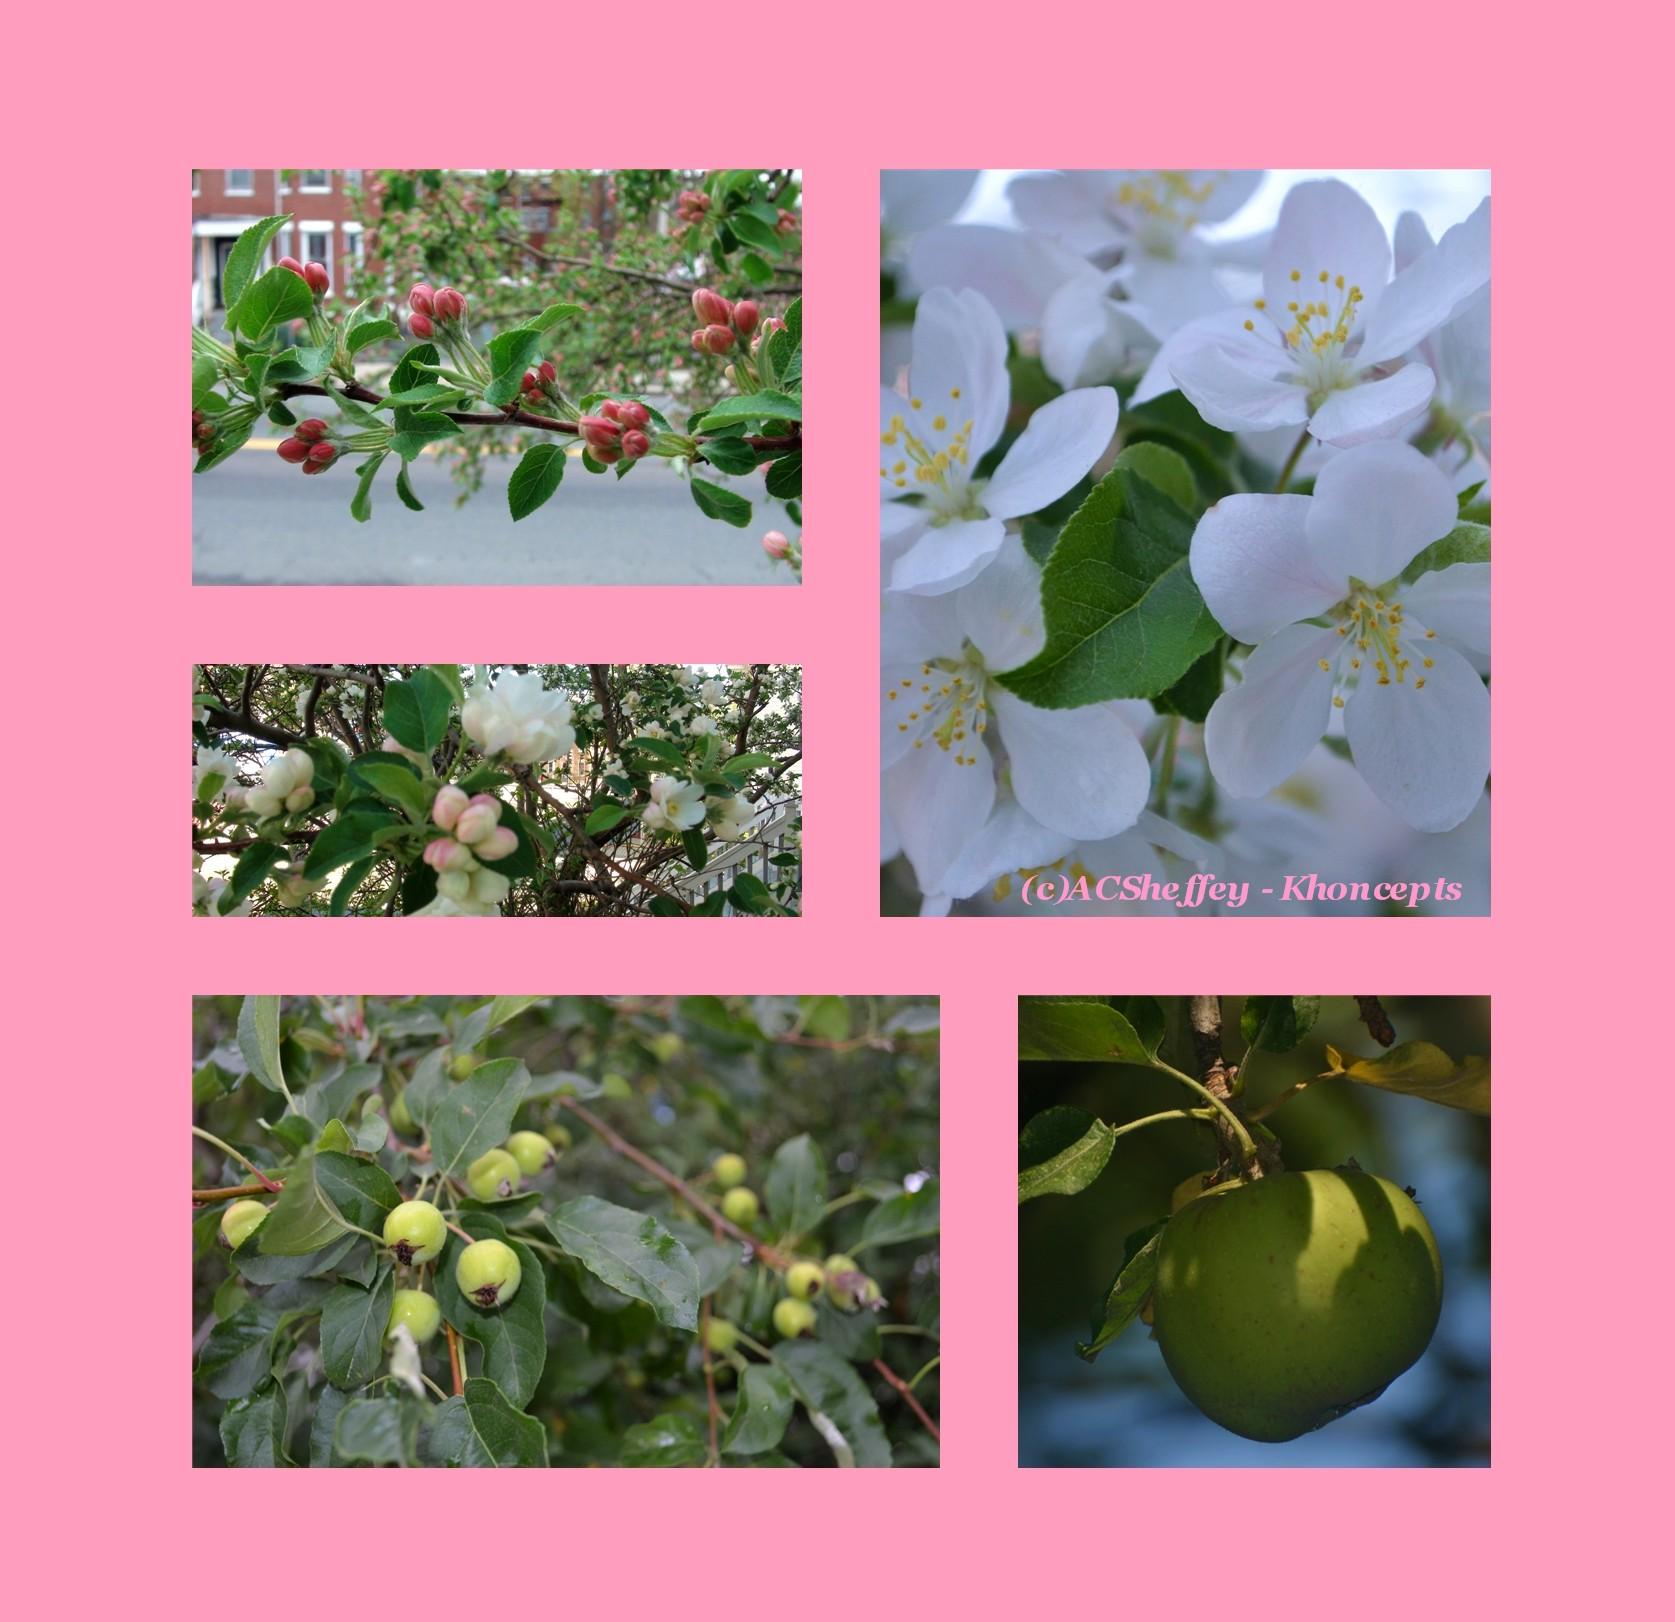 Our Ghetto Fabulous Front Yard Apple Tree (Roxbury, MA